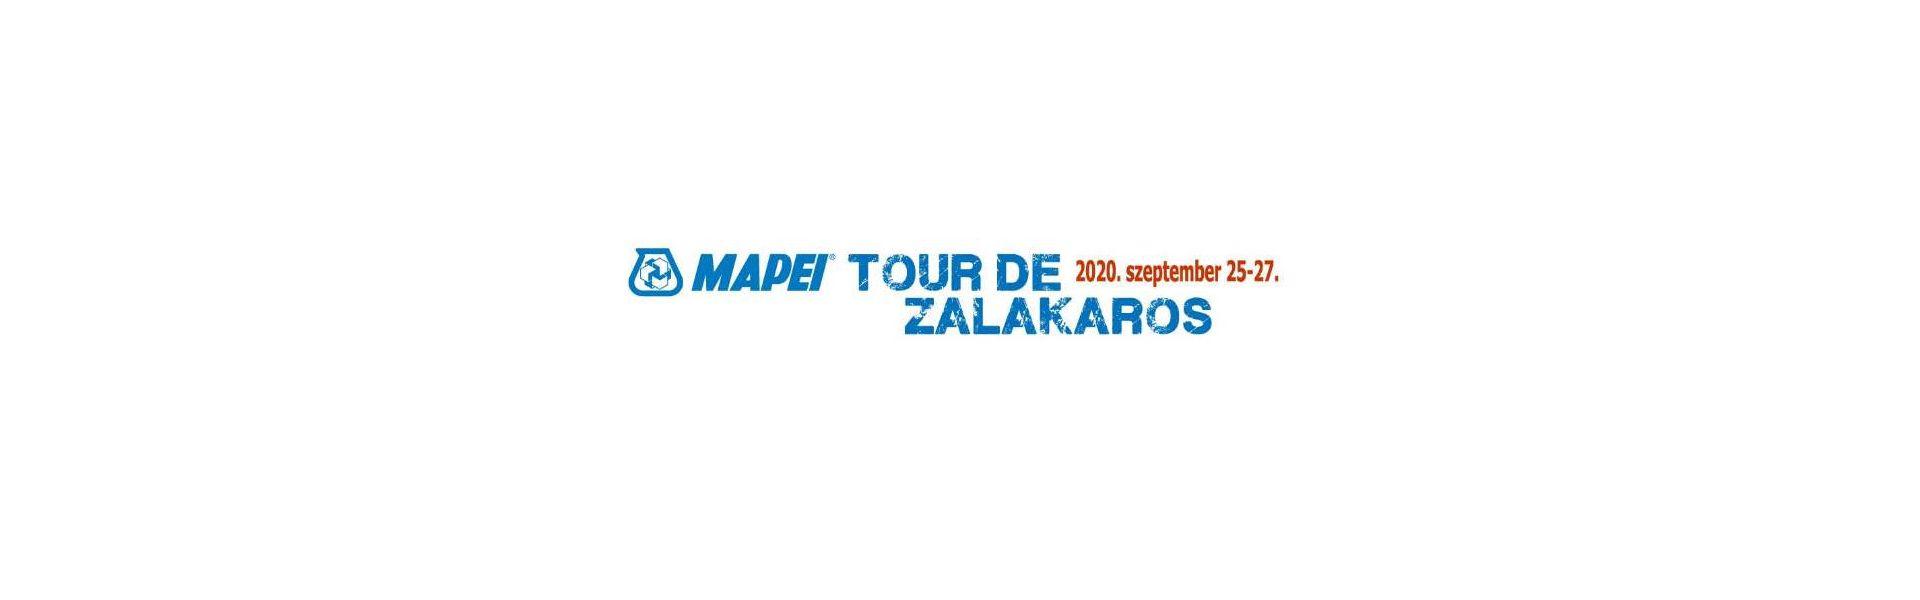 Új időpontban a 2020-as MAPEI Tour de Zalakaros